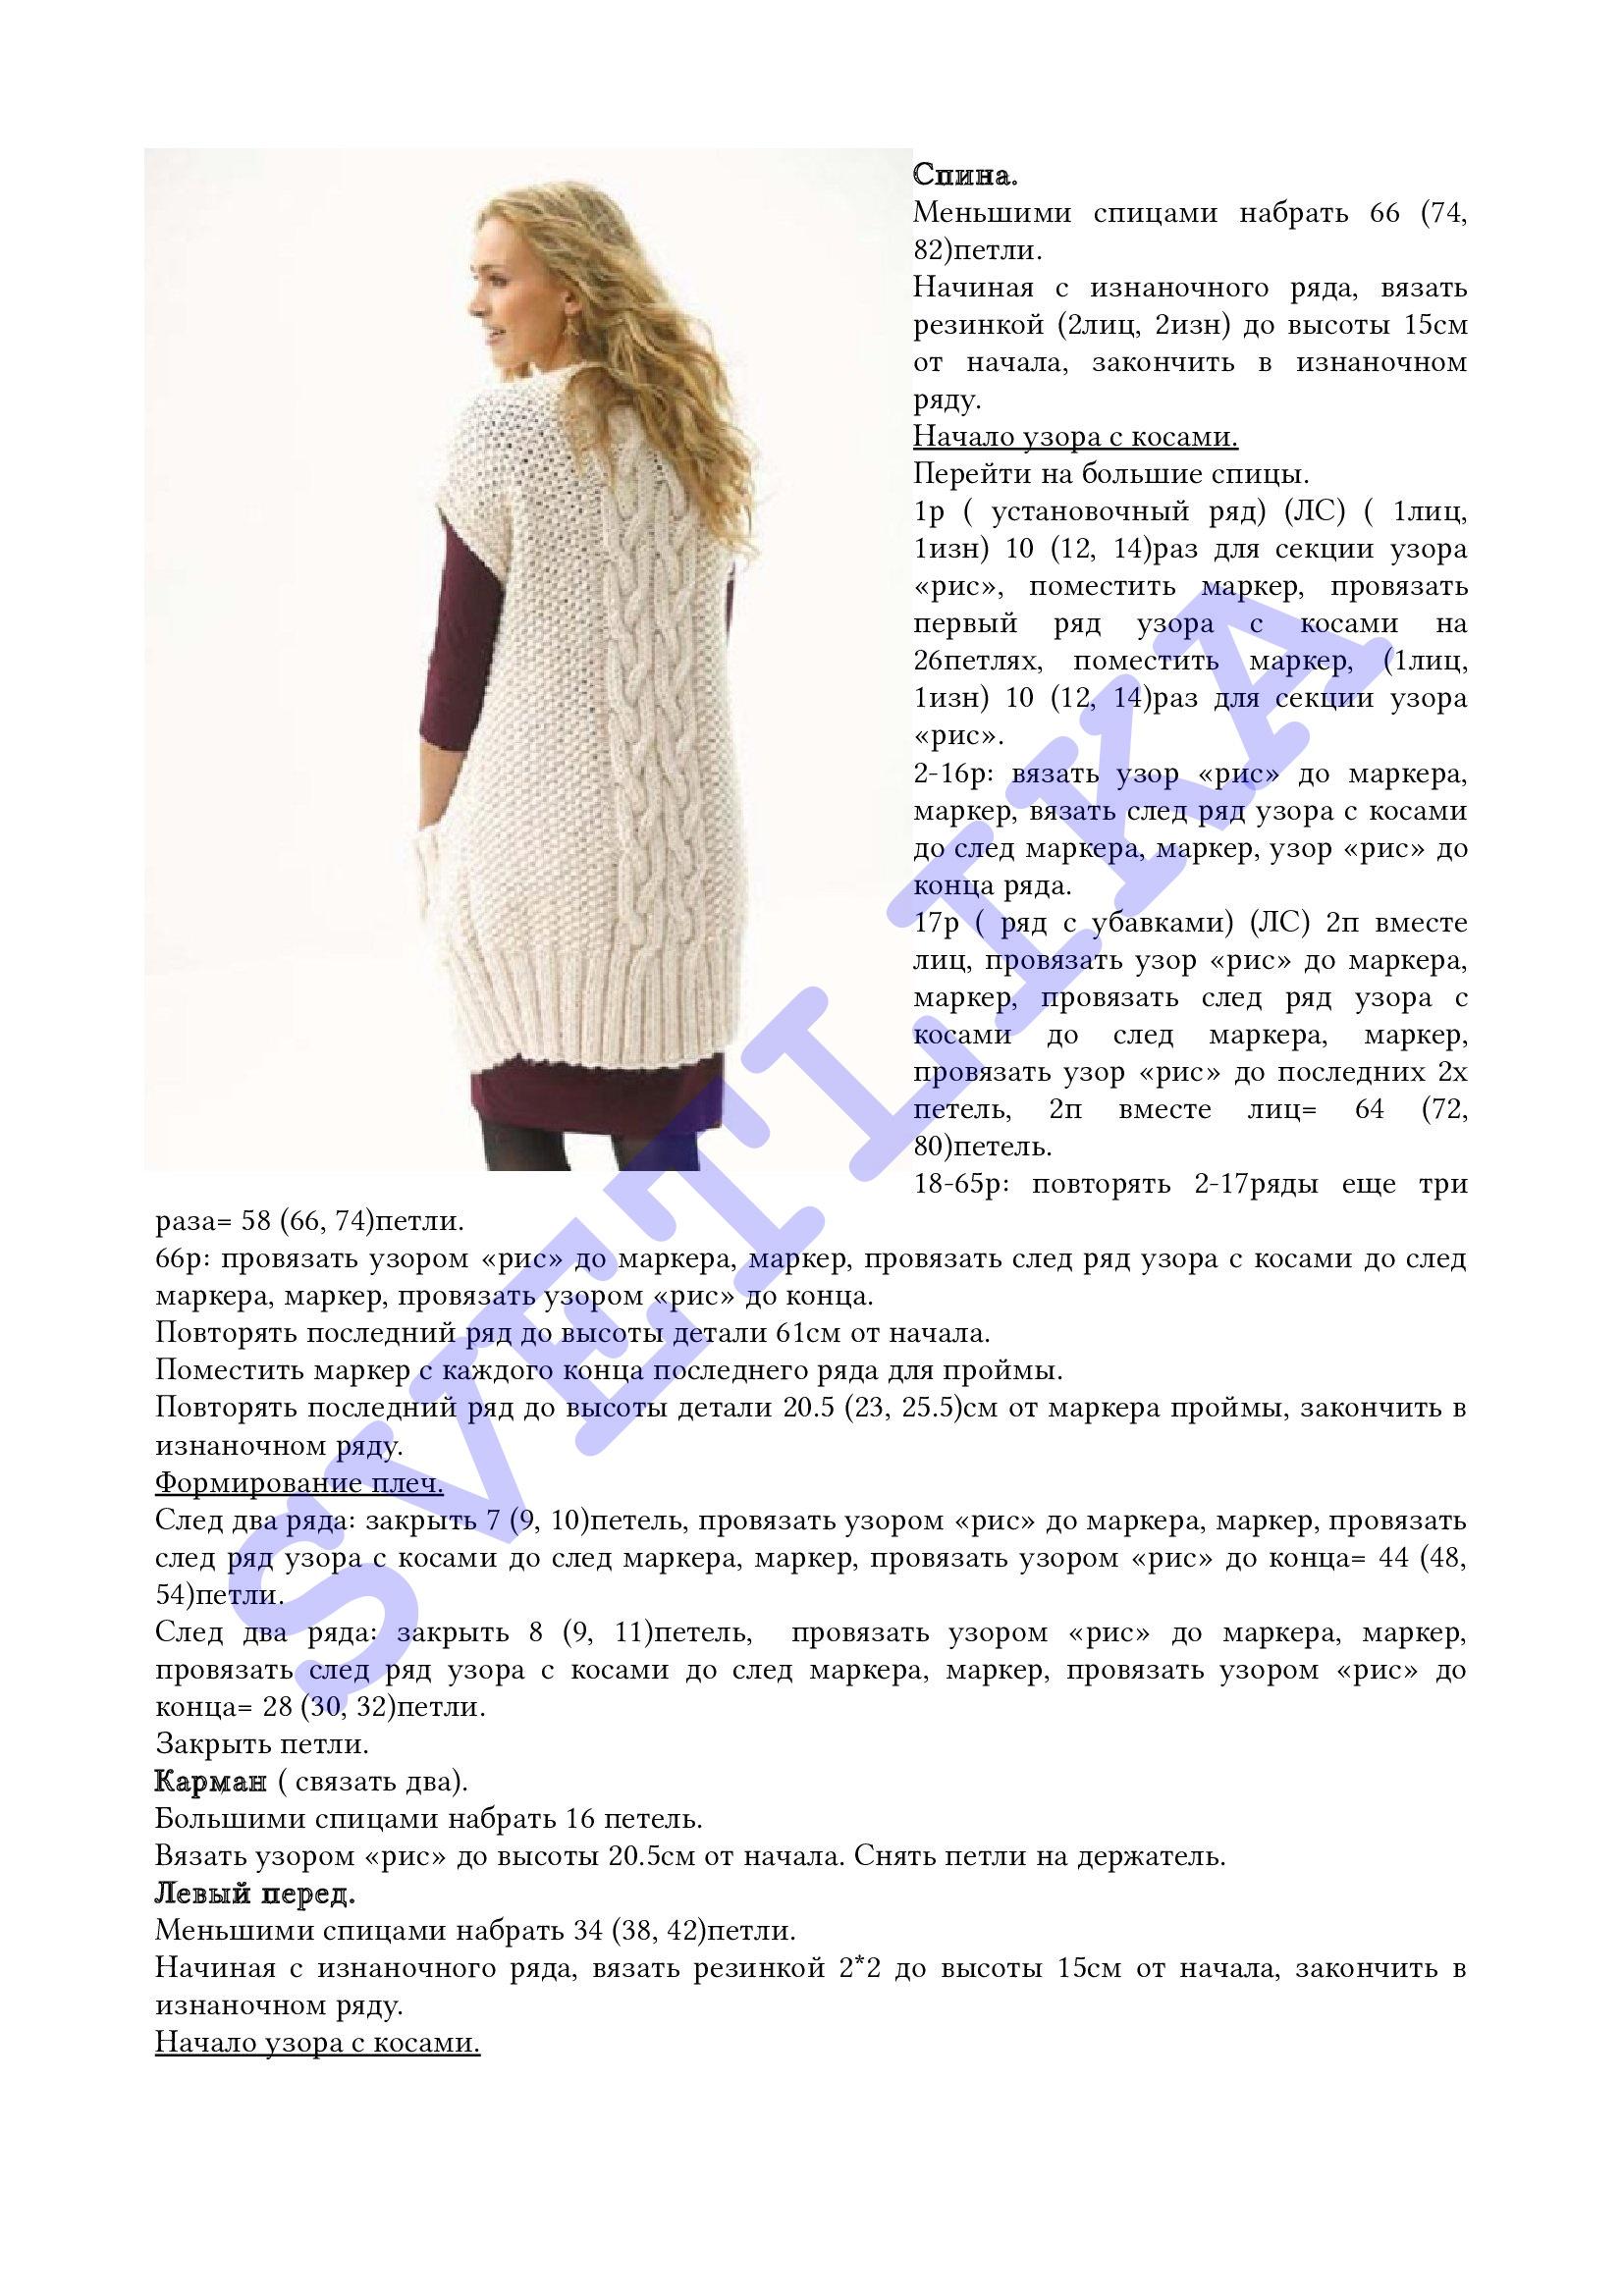 https://img-fotki.yandex.ru/get/9835/125862467.58/0_151e7d_24259fe8_orig